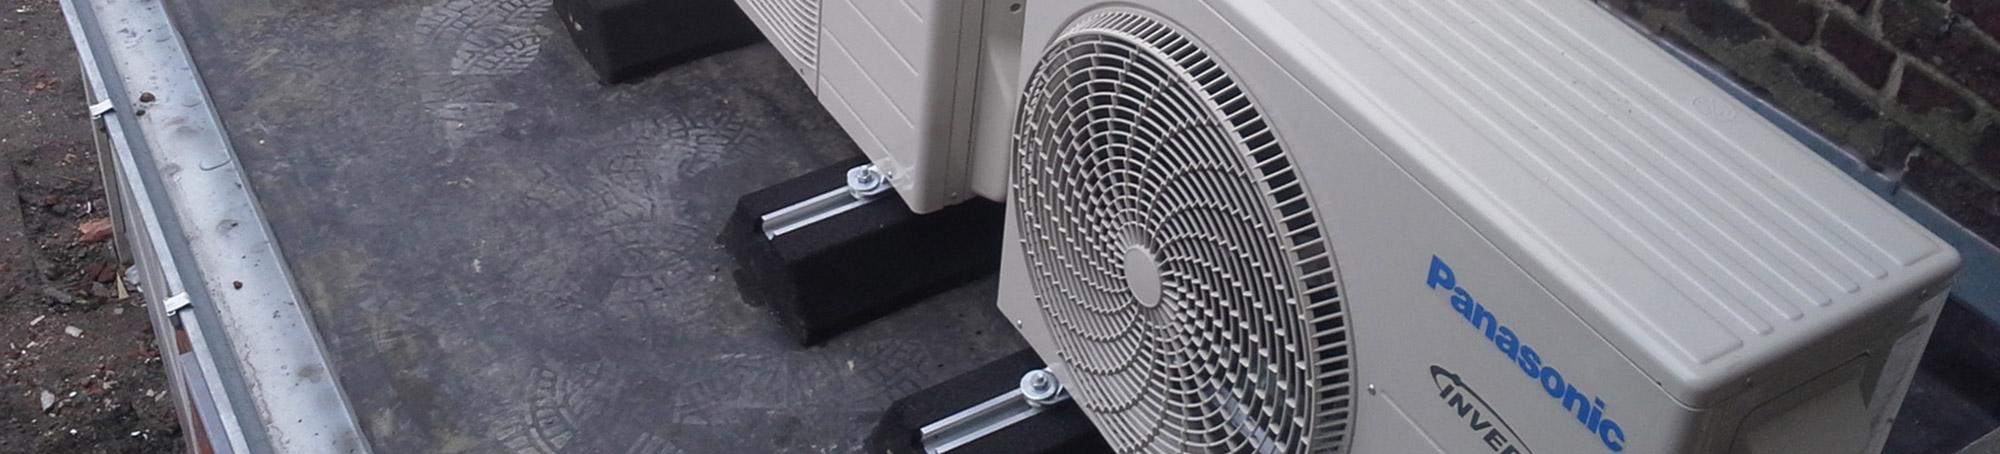 Equipement de climatisation